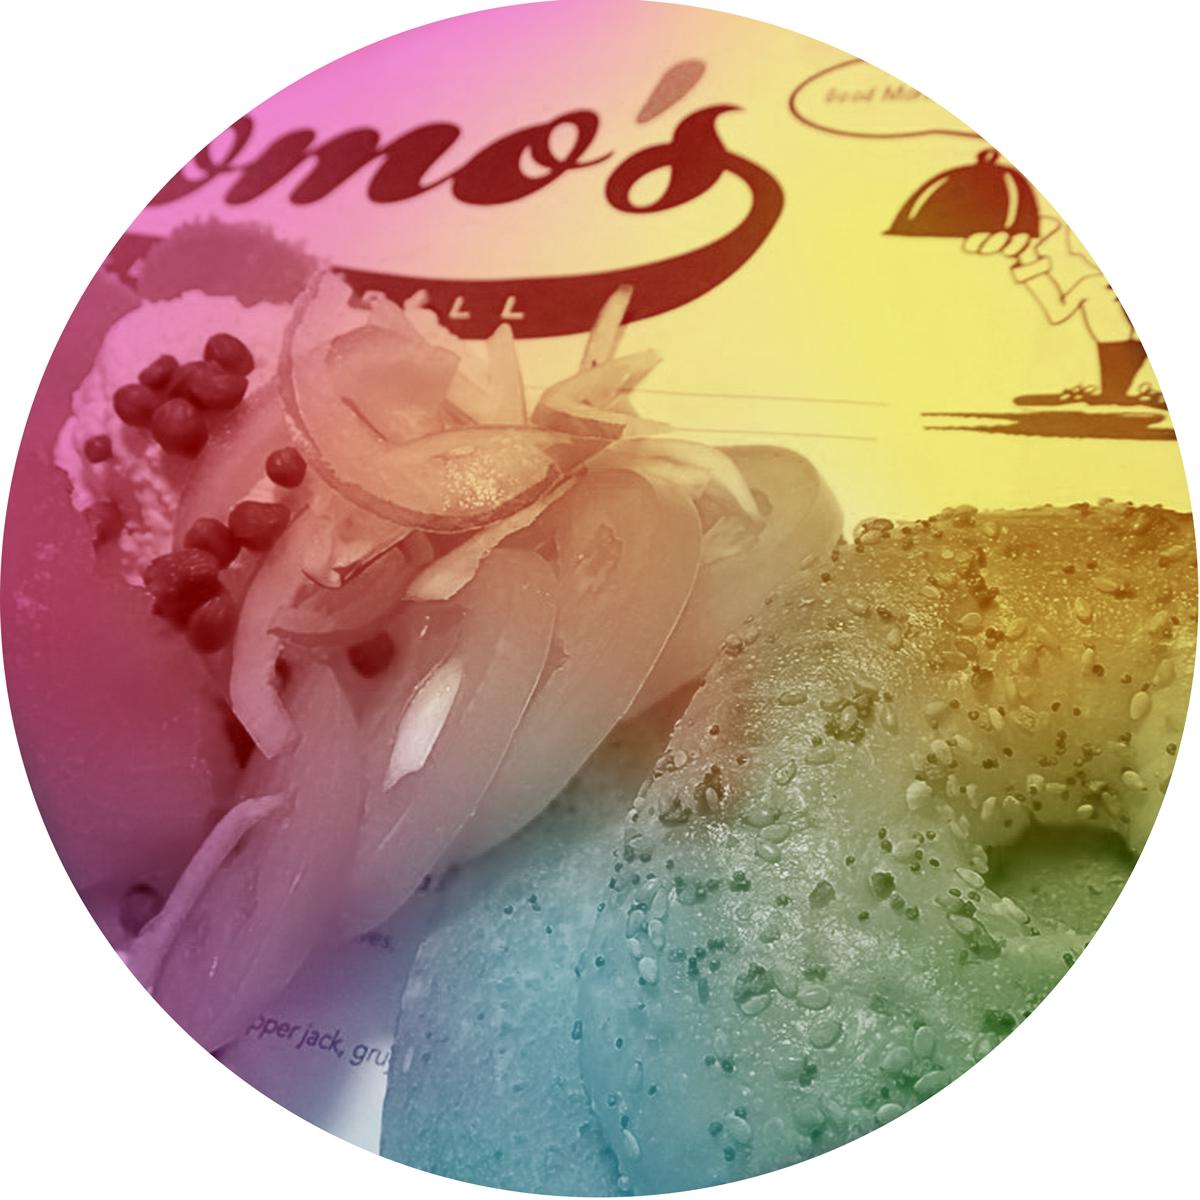 Shlomo-CalendarImage-1.png